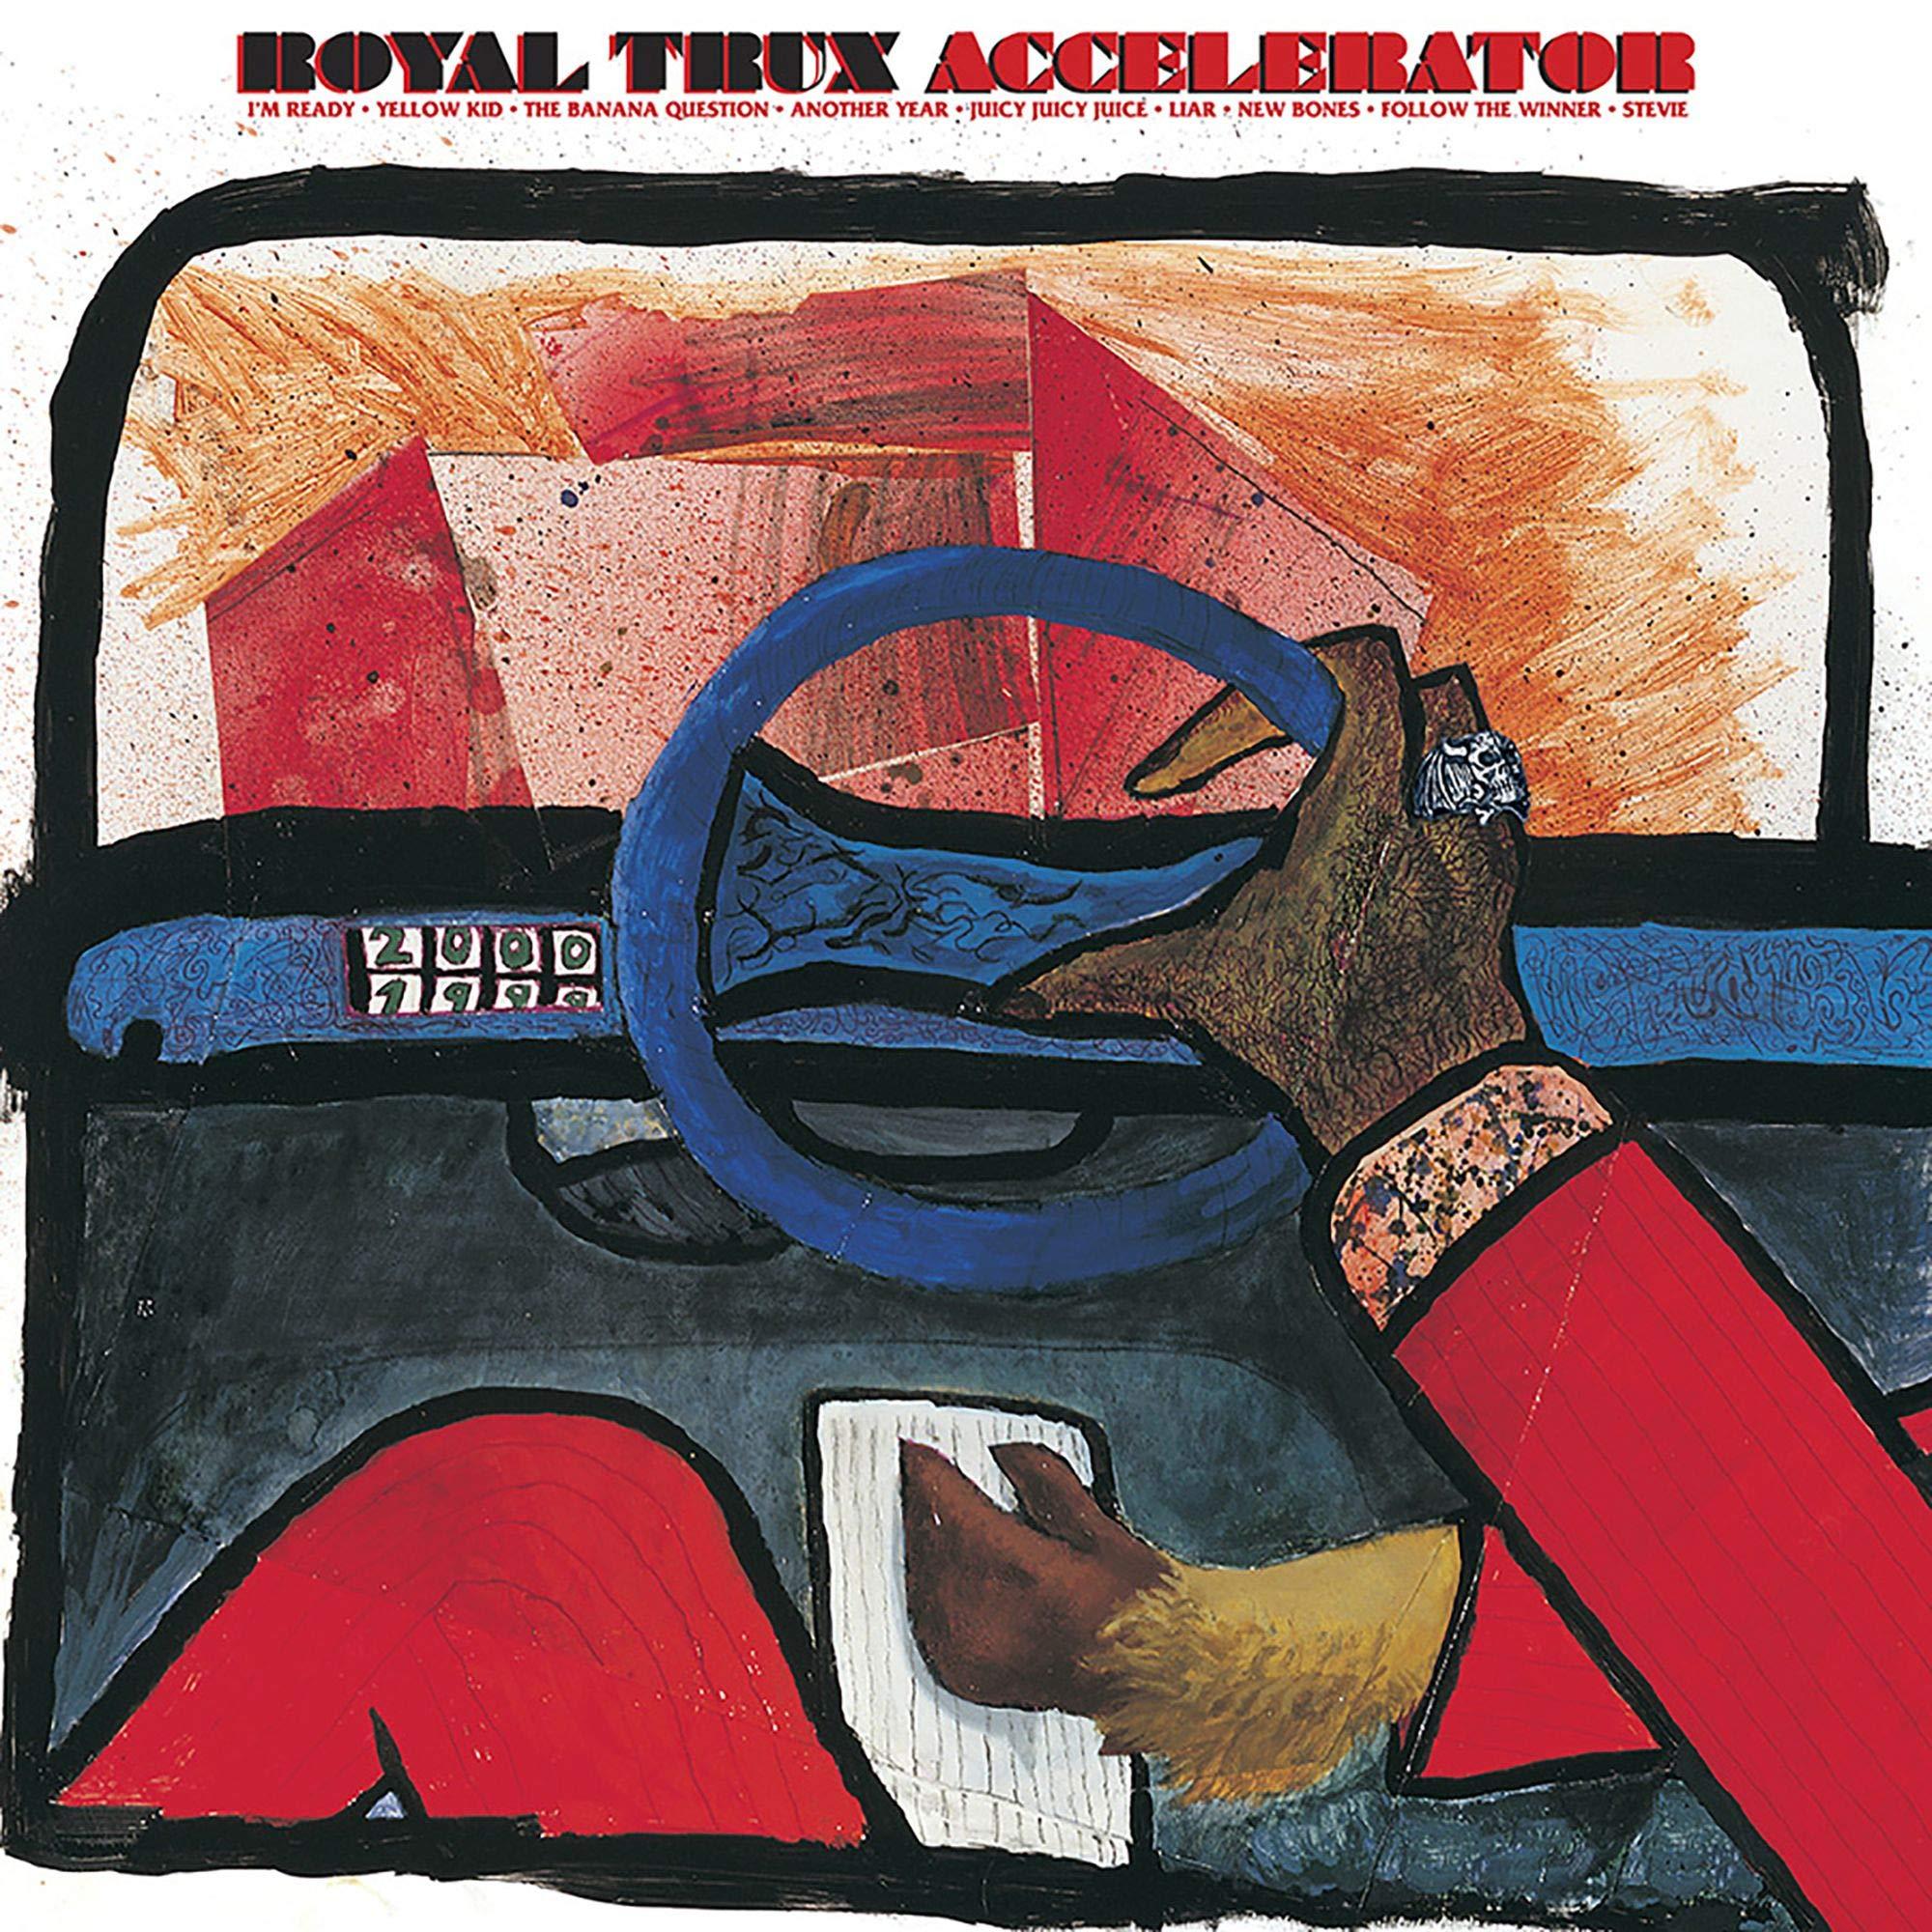 Vinilo : Royal Trux - Accelerator (LP Vinyl)